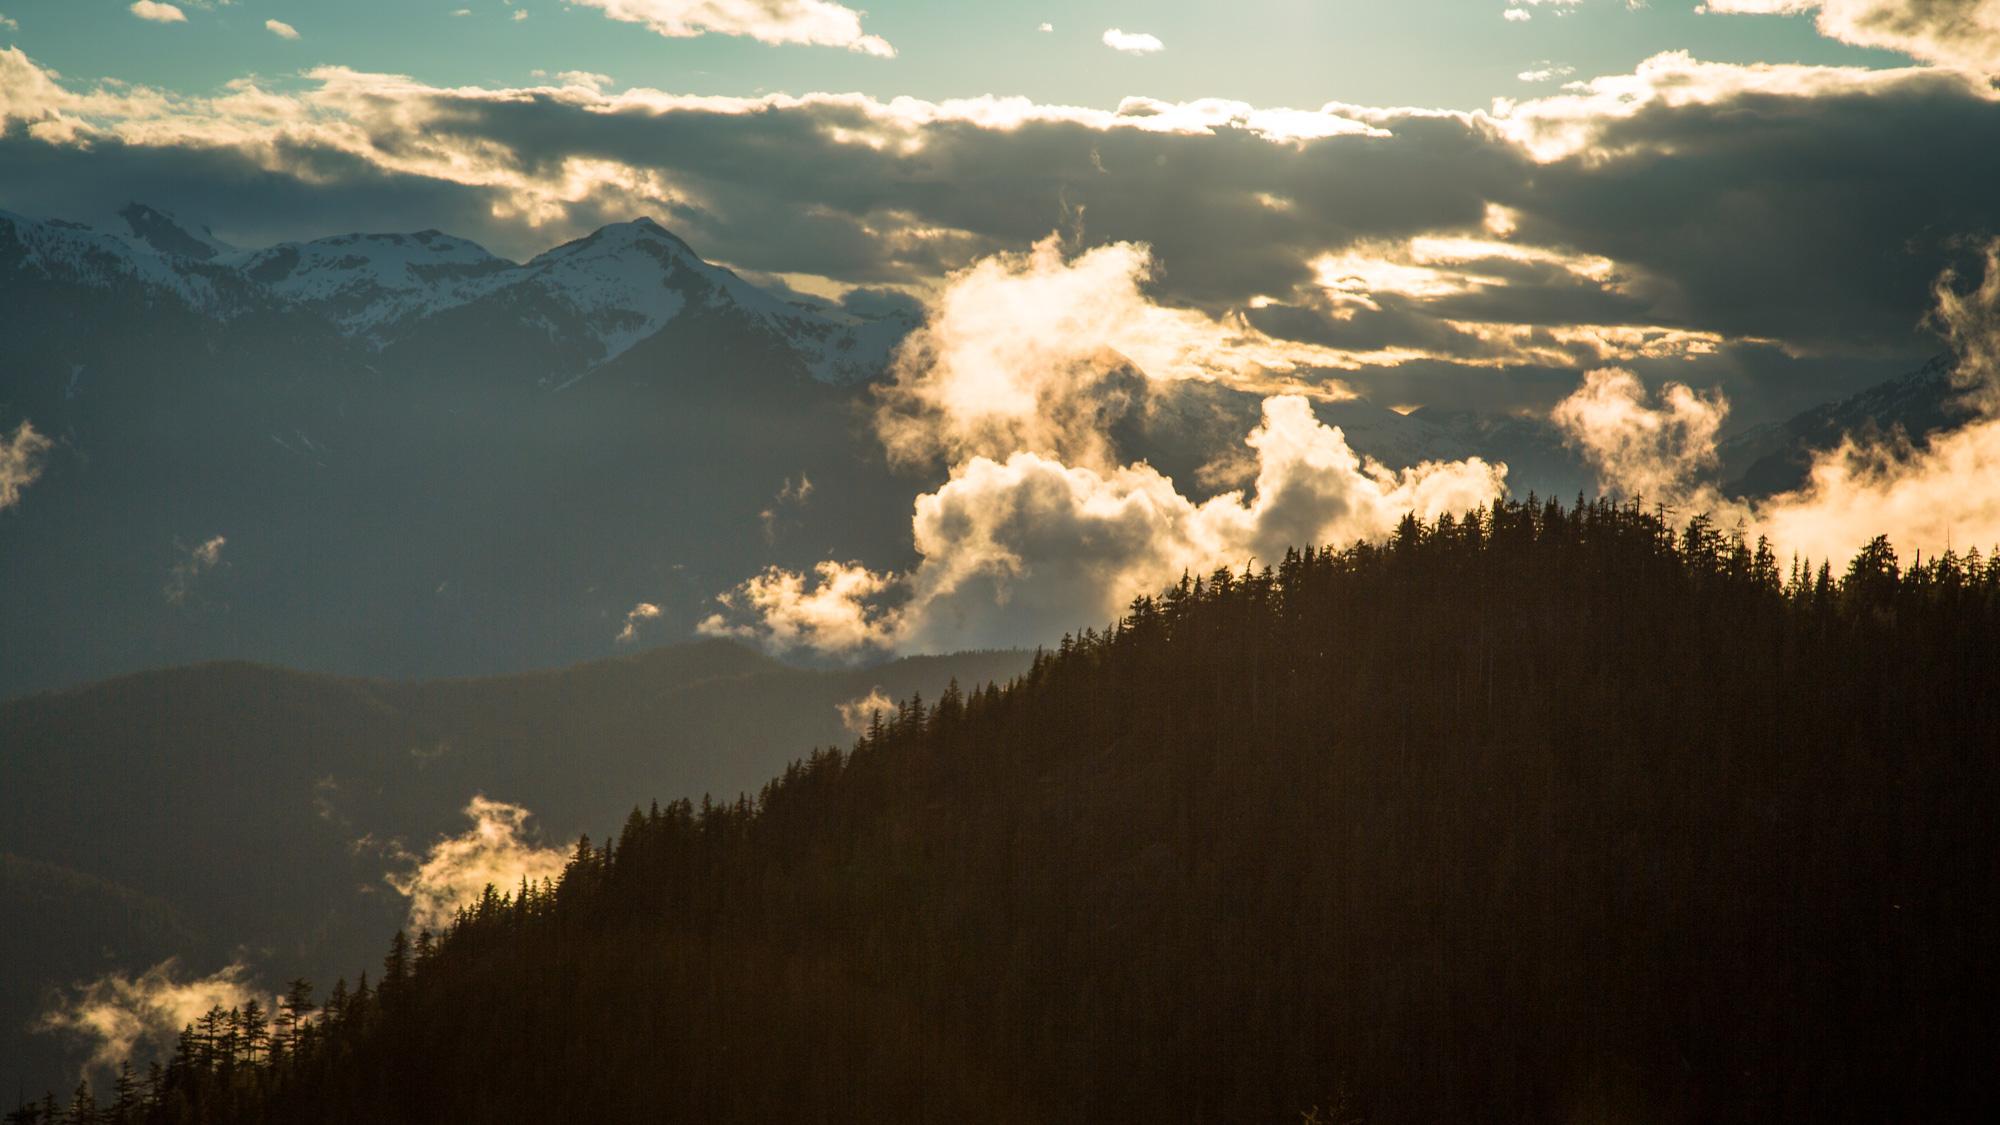 061817-Squamish-90.jpg